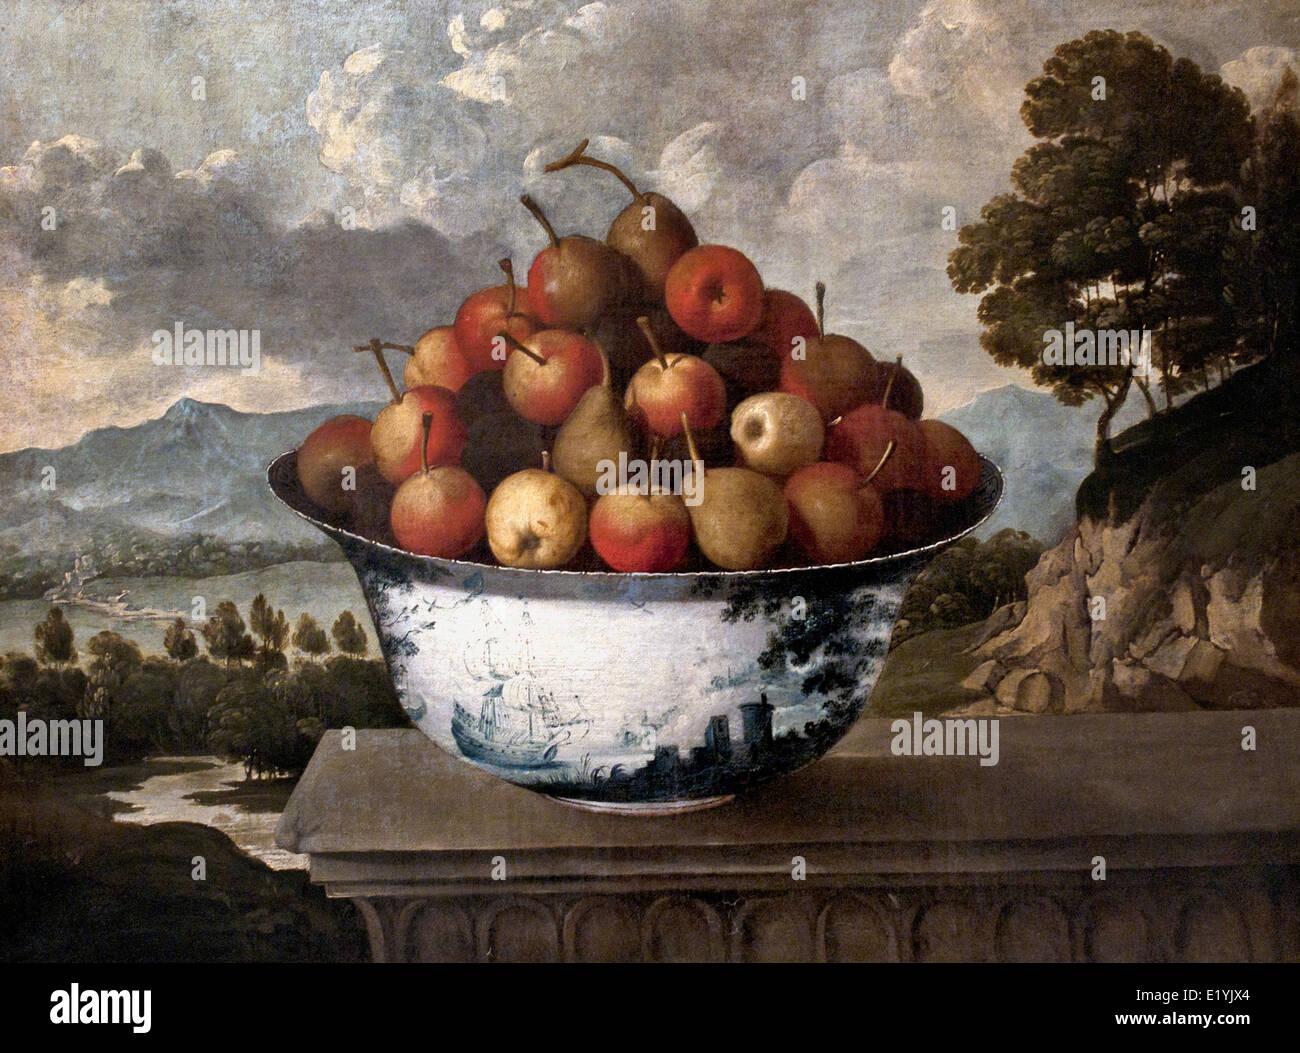 BODEGÓN CON CERÁMICA - BODEGÓN CON cerámica o Tomás Yepes Yepes (Valencia 1595 - 1674) Imagen De Stock